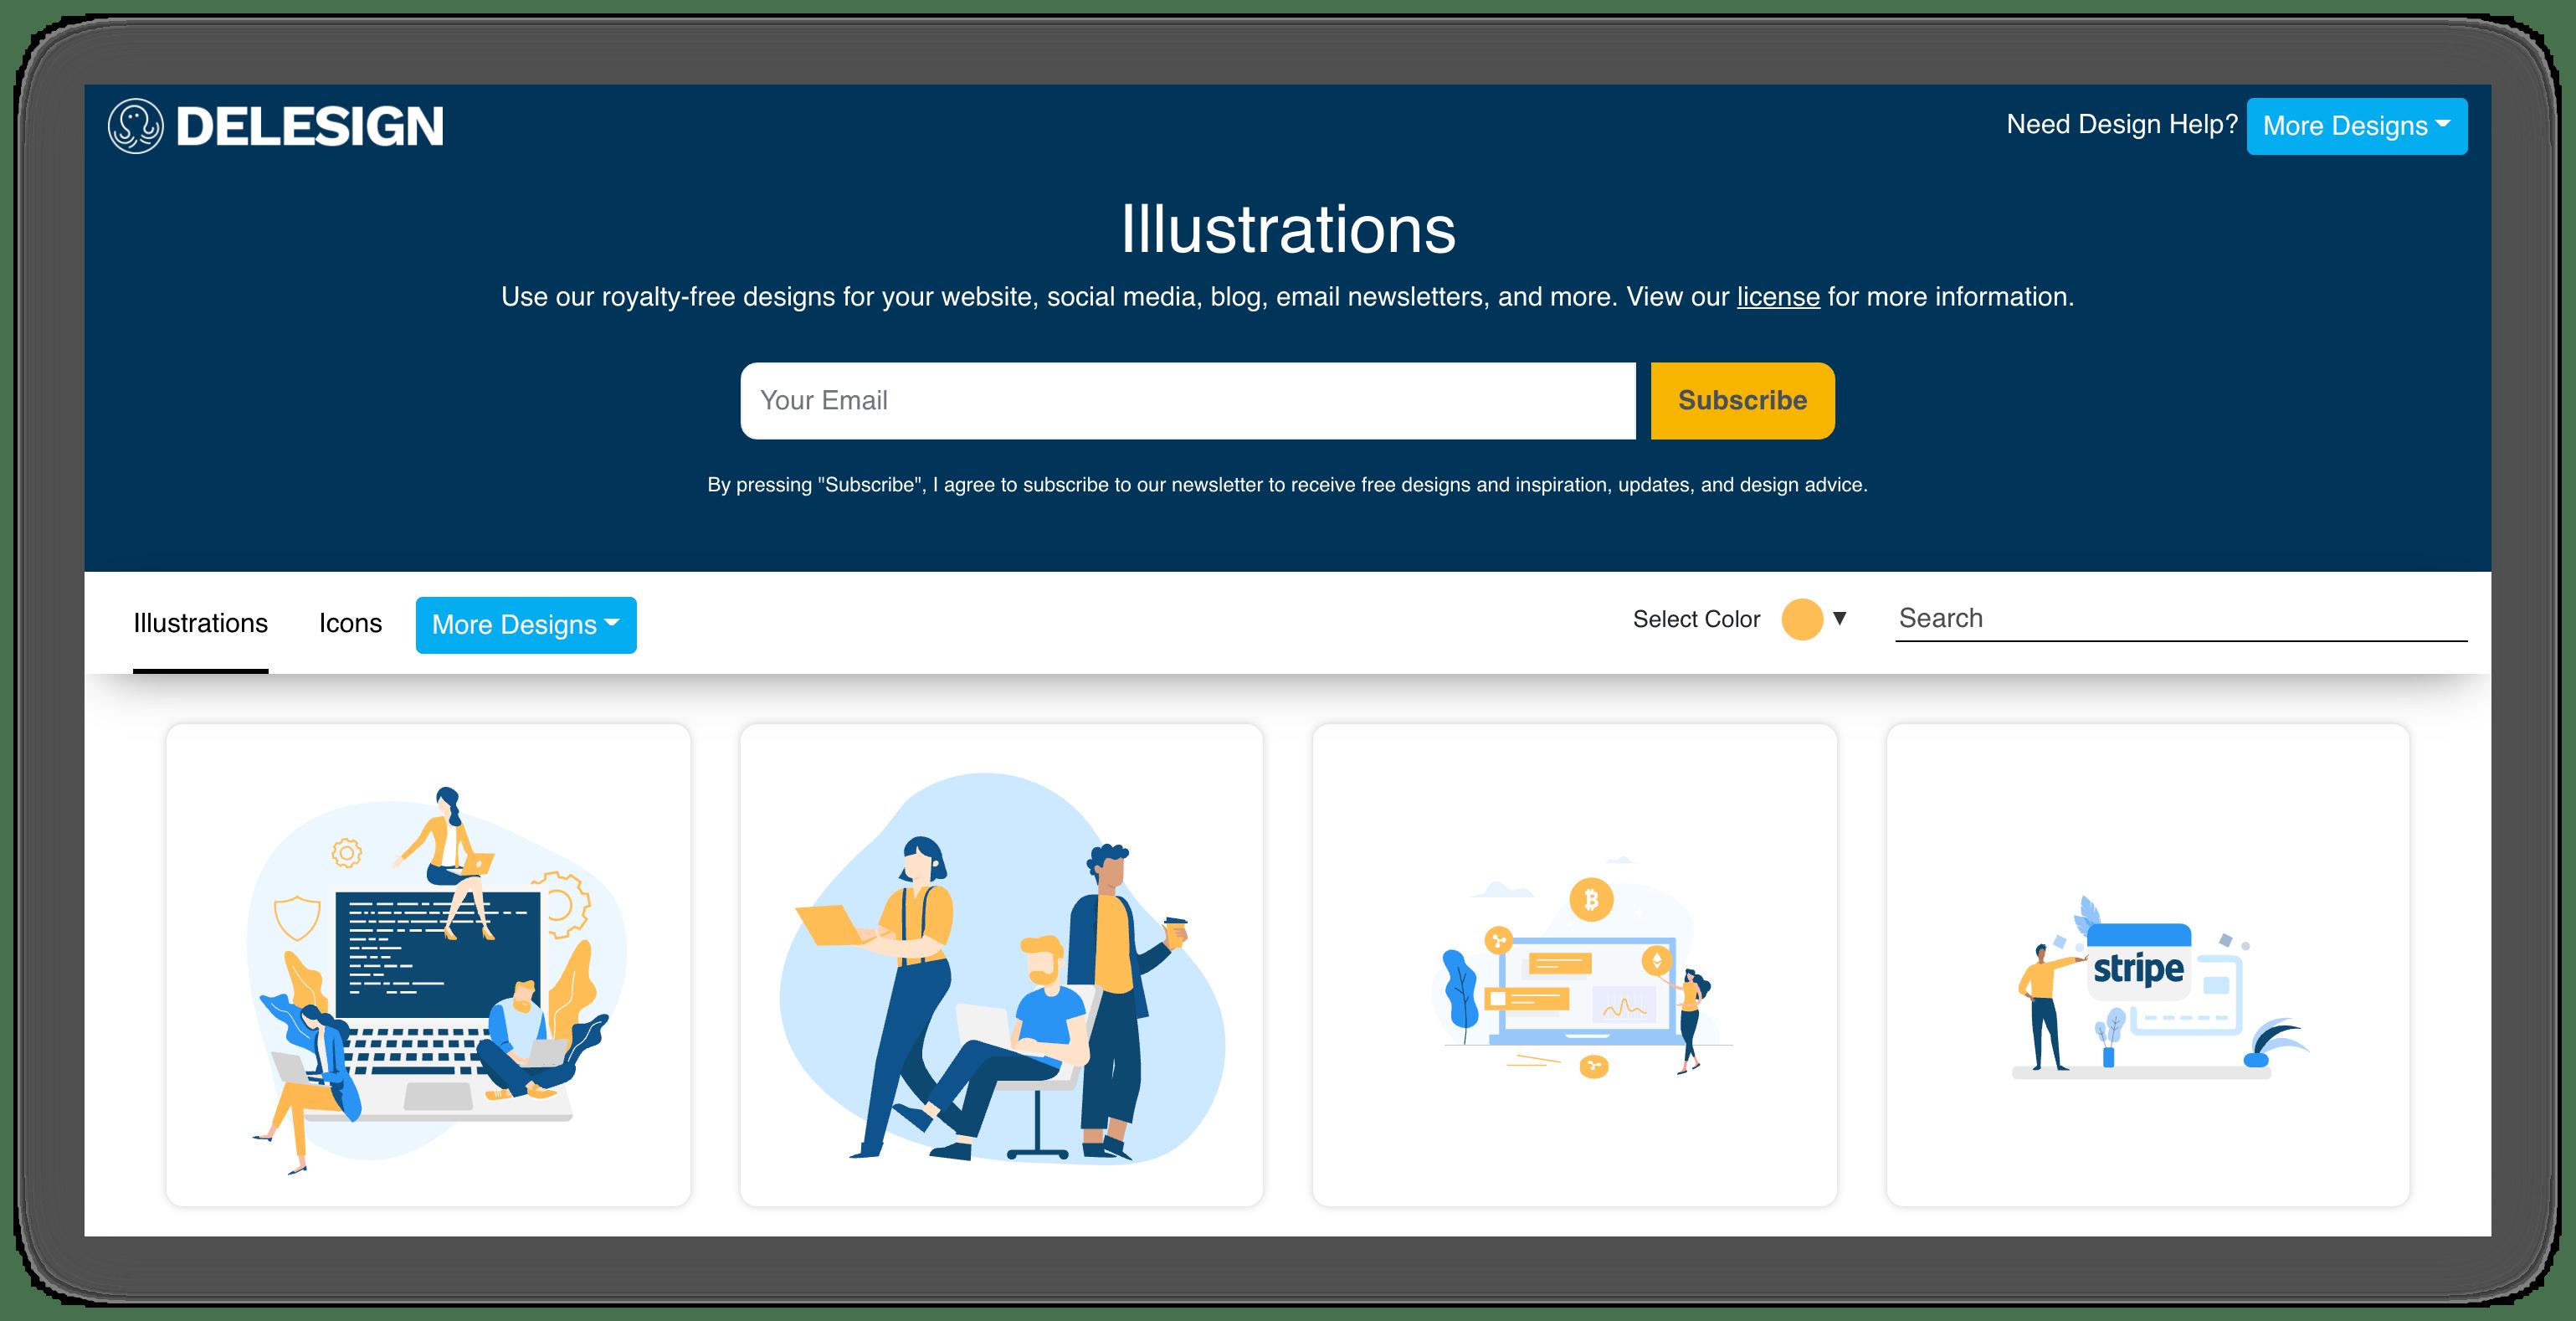 delesign illustrations website